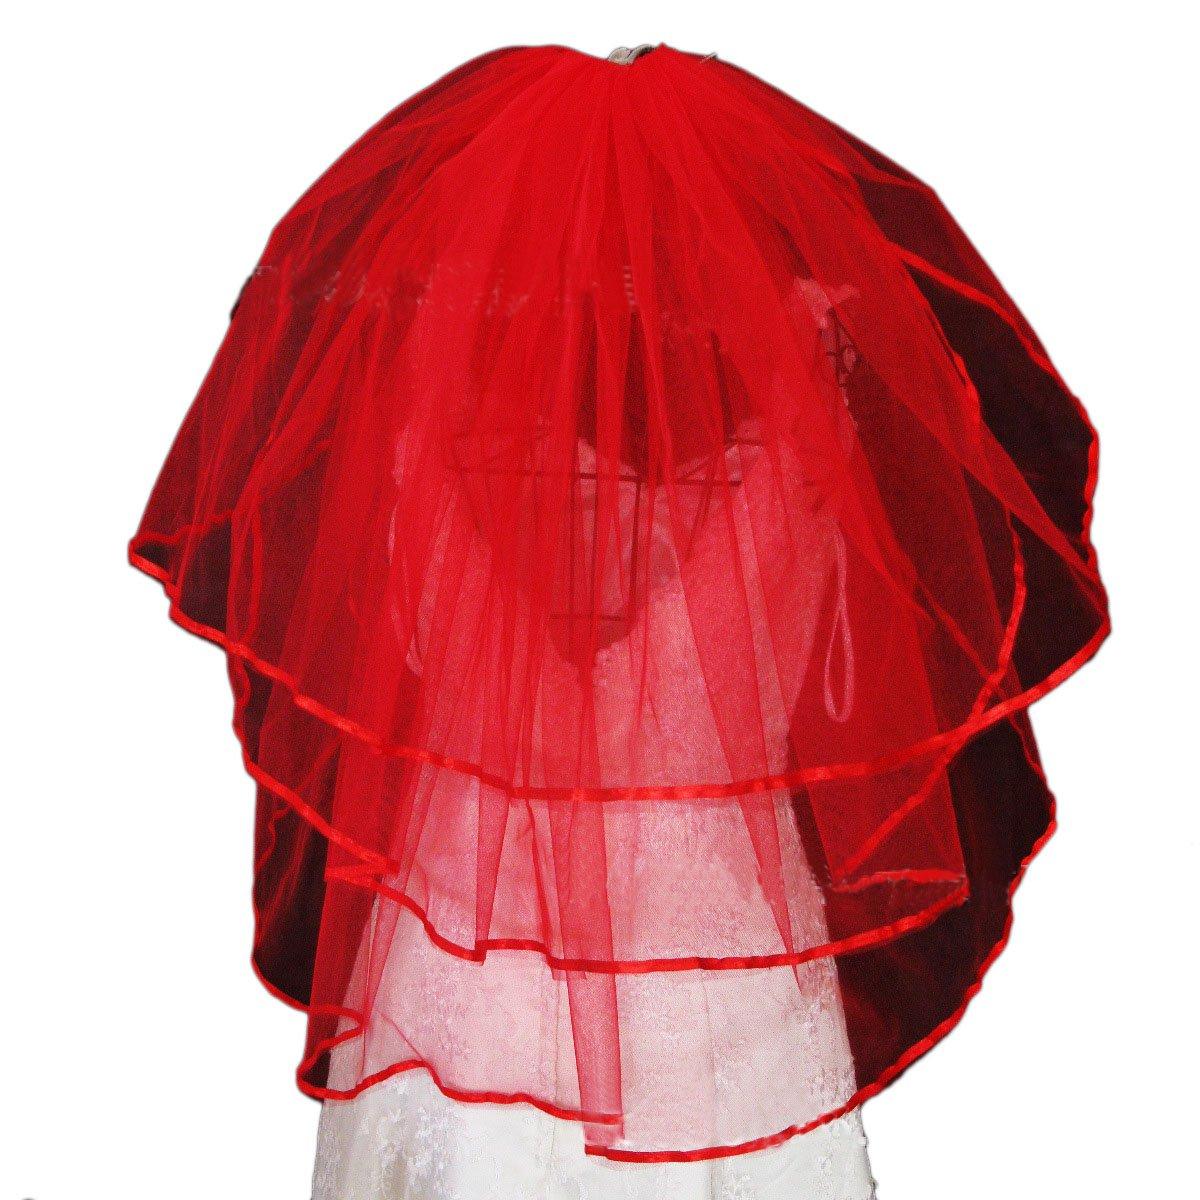 Vimans 2018 Women's Fashion Short Bridal Wedding Veils with Comb VL001